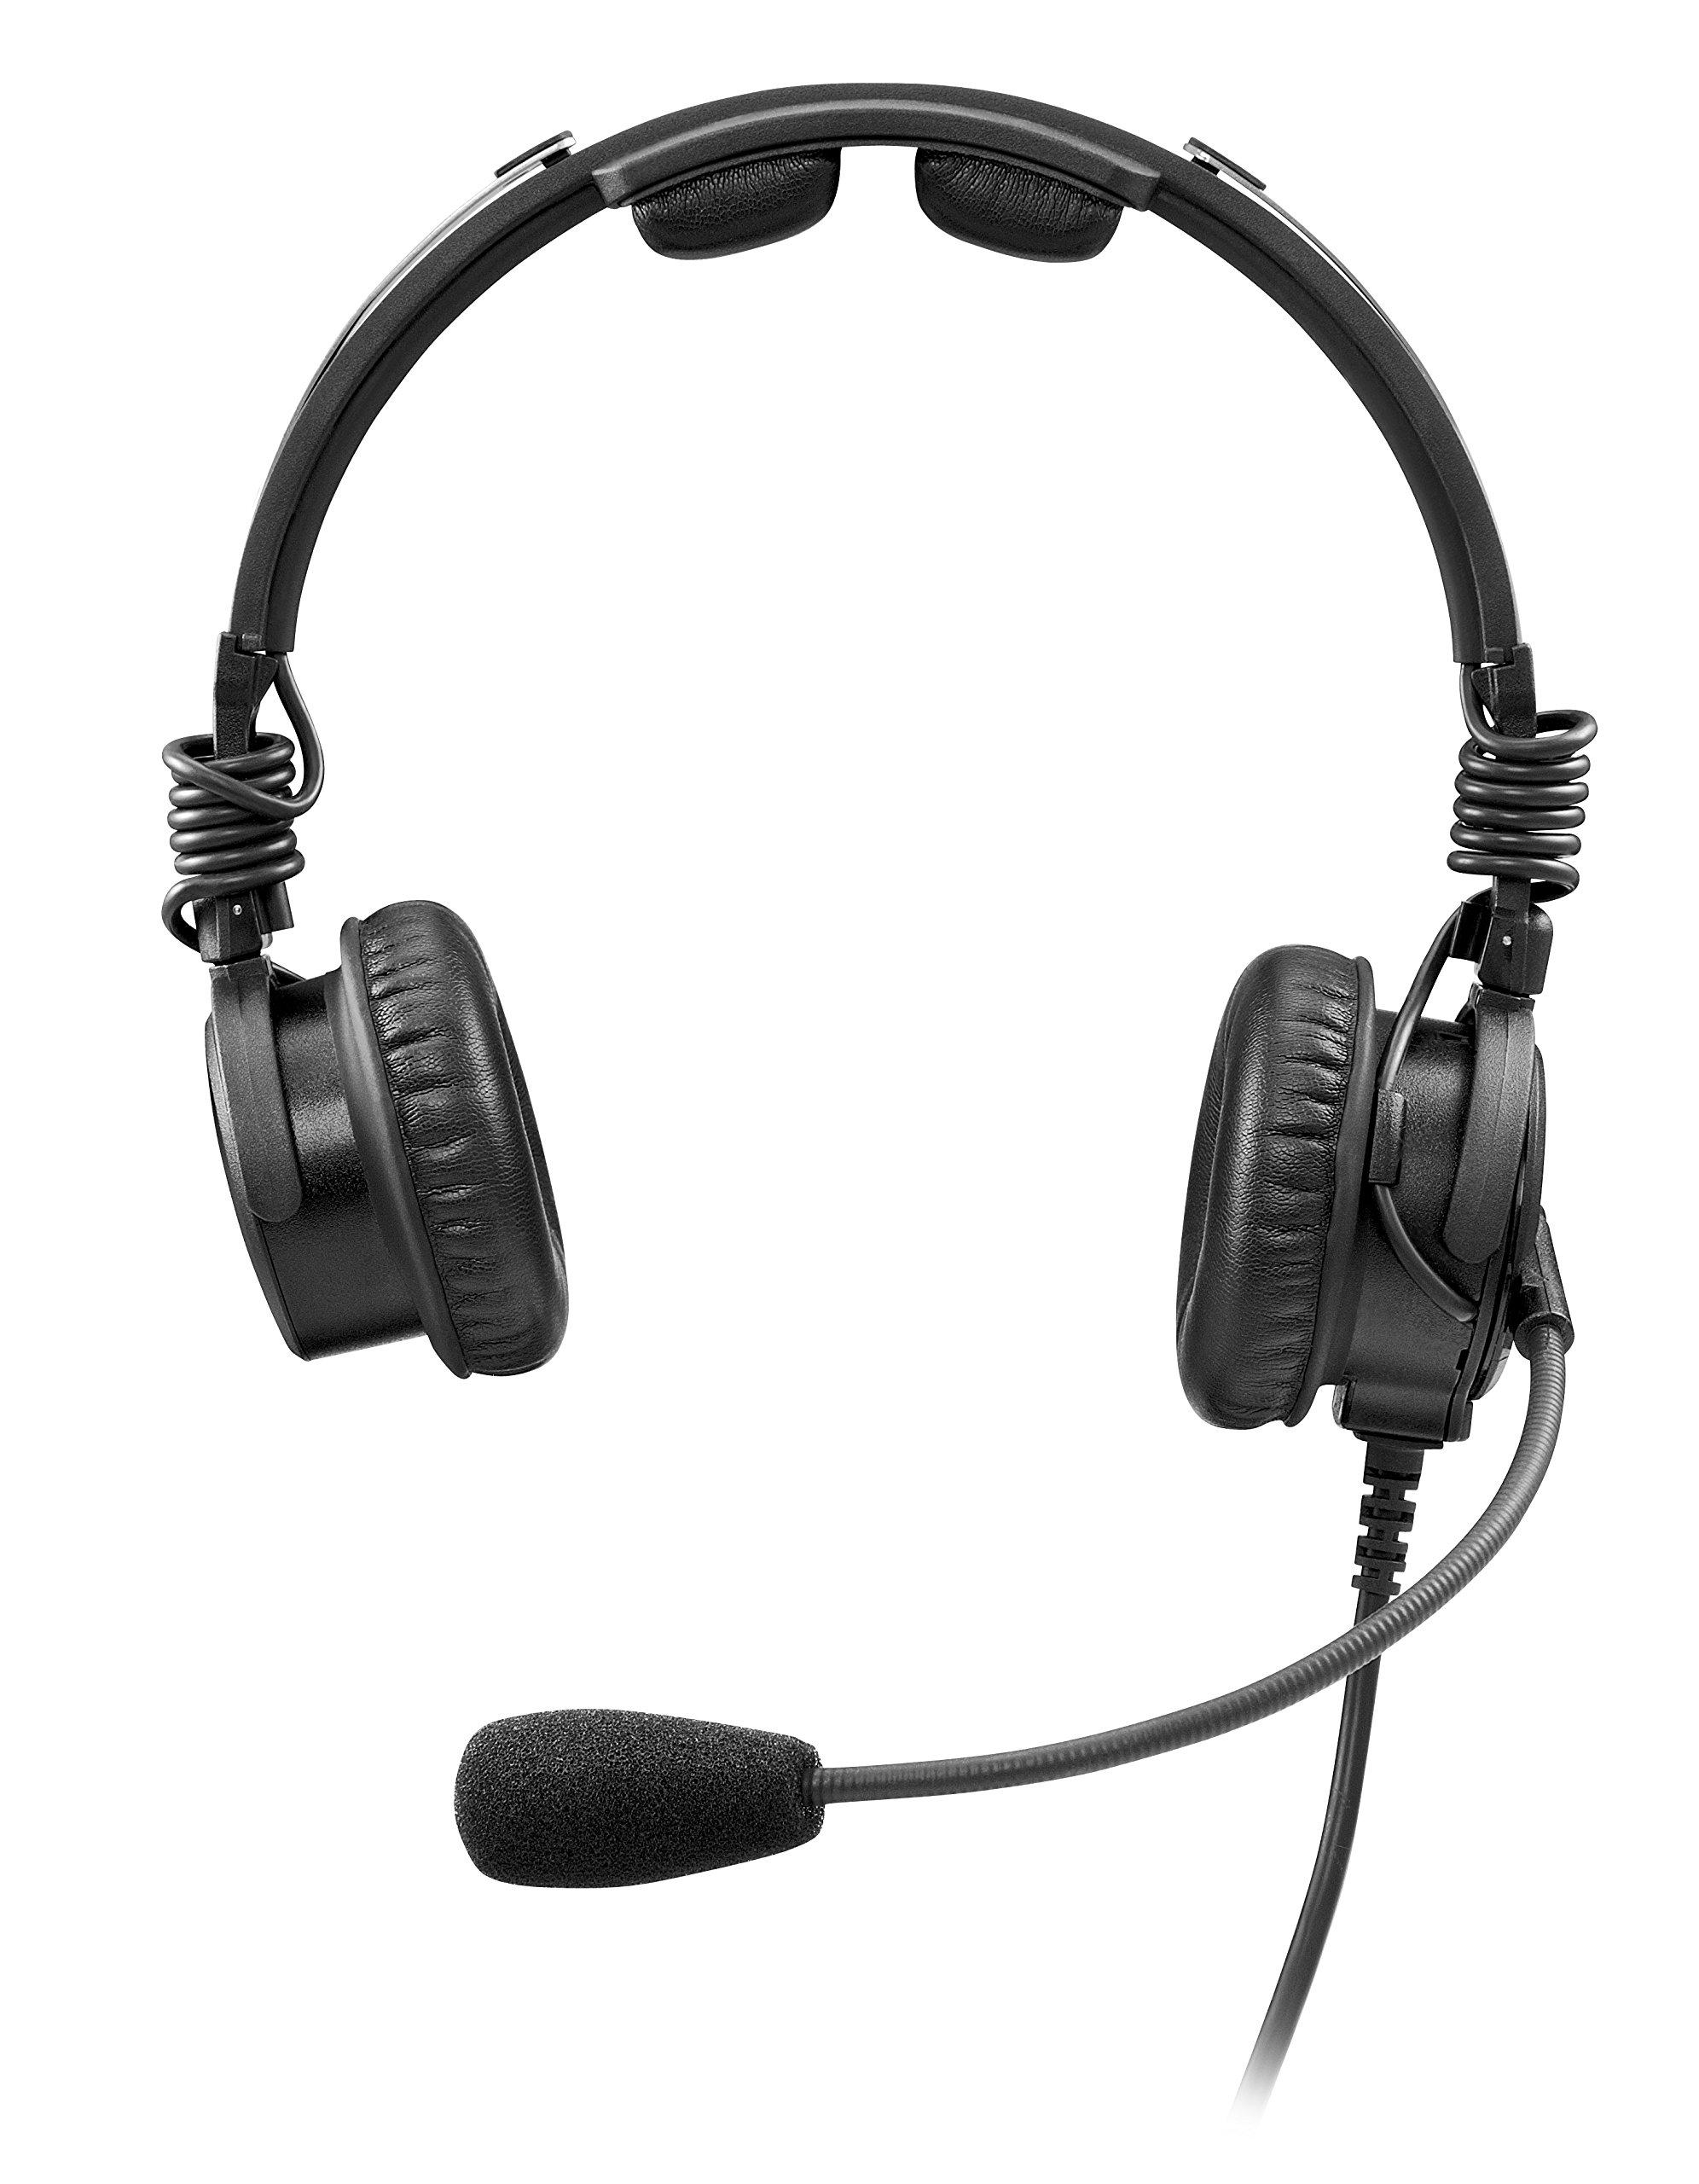 Telex Airman 8 ANR Headset - Dual GA Plugs